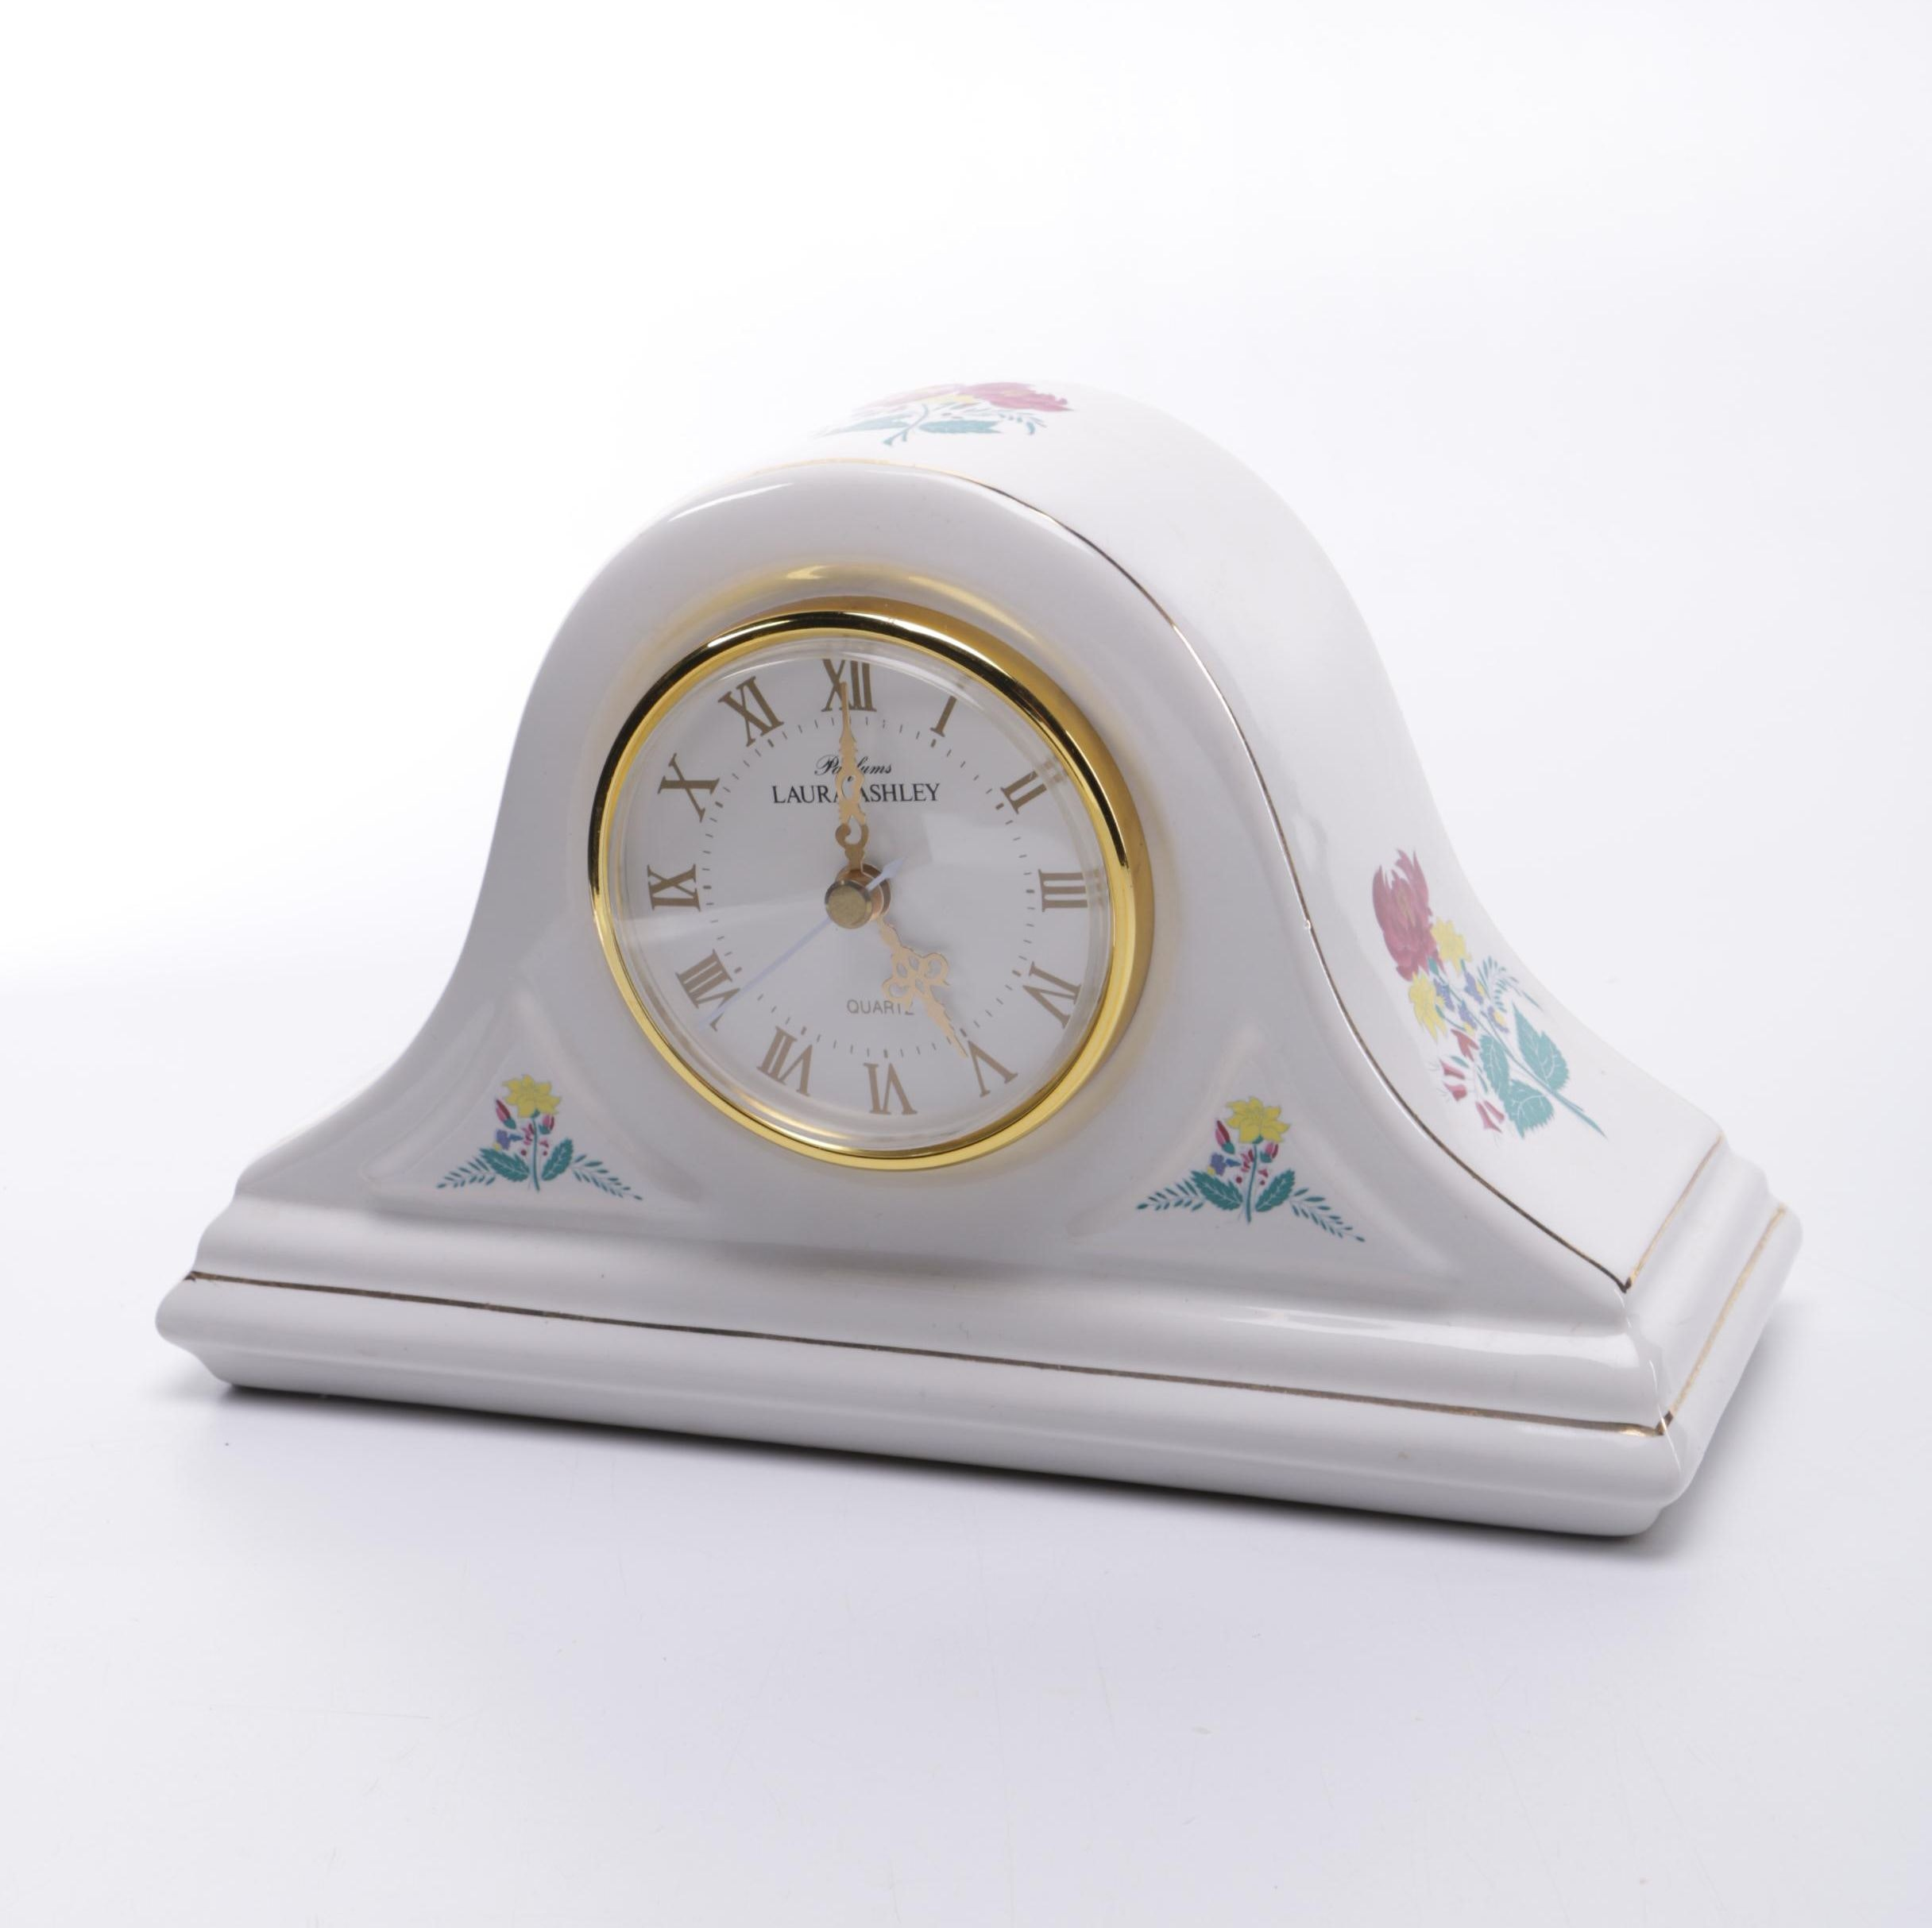 Laura Ashley Mantel Clock